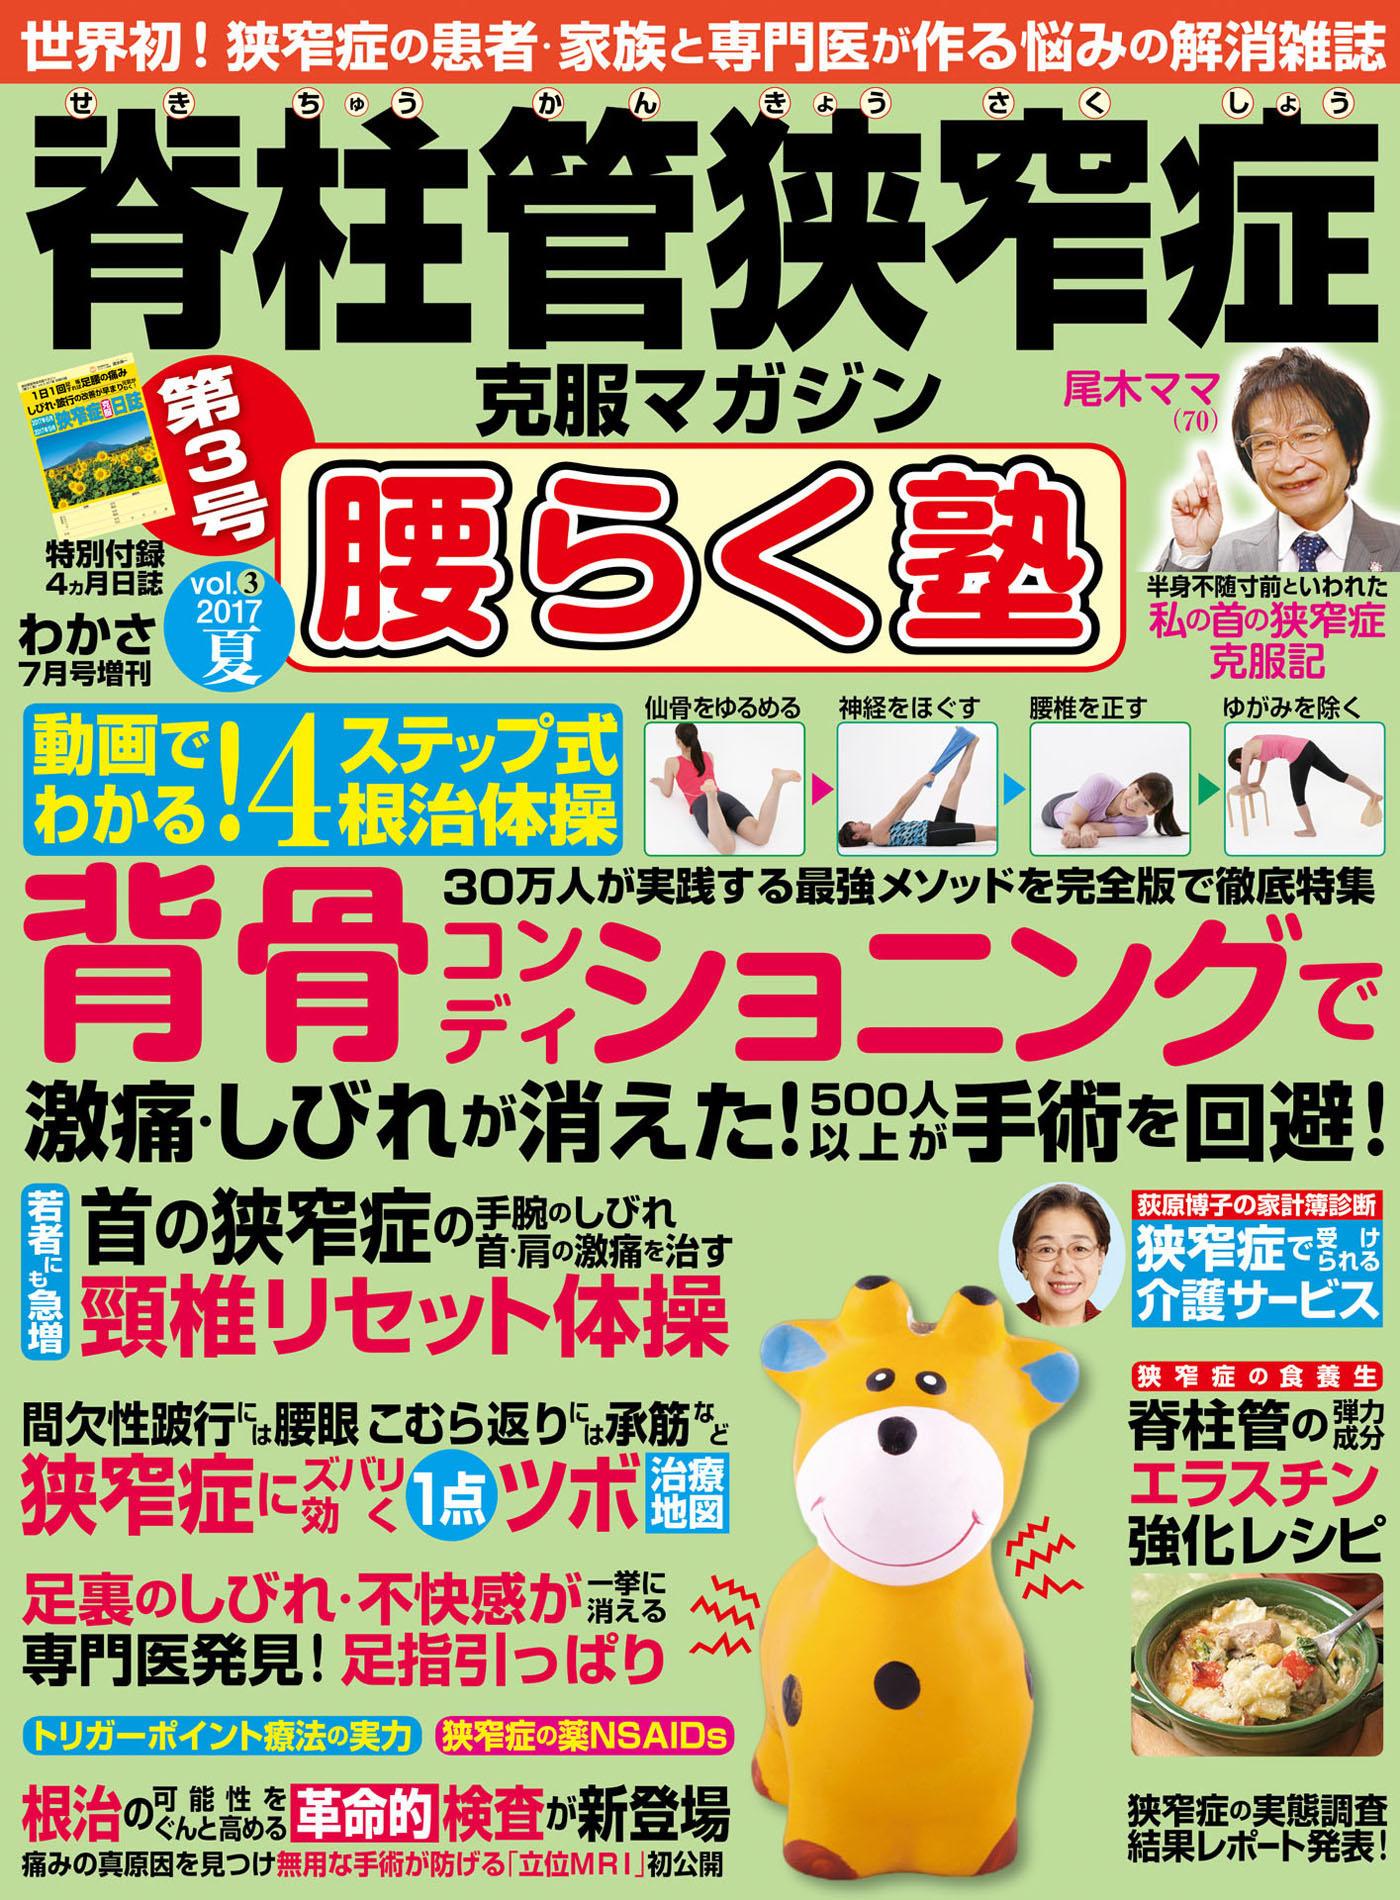 kosiraku_001.jpg